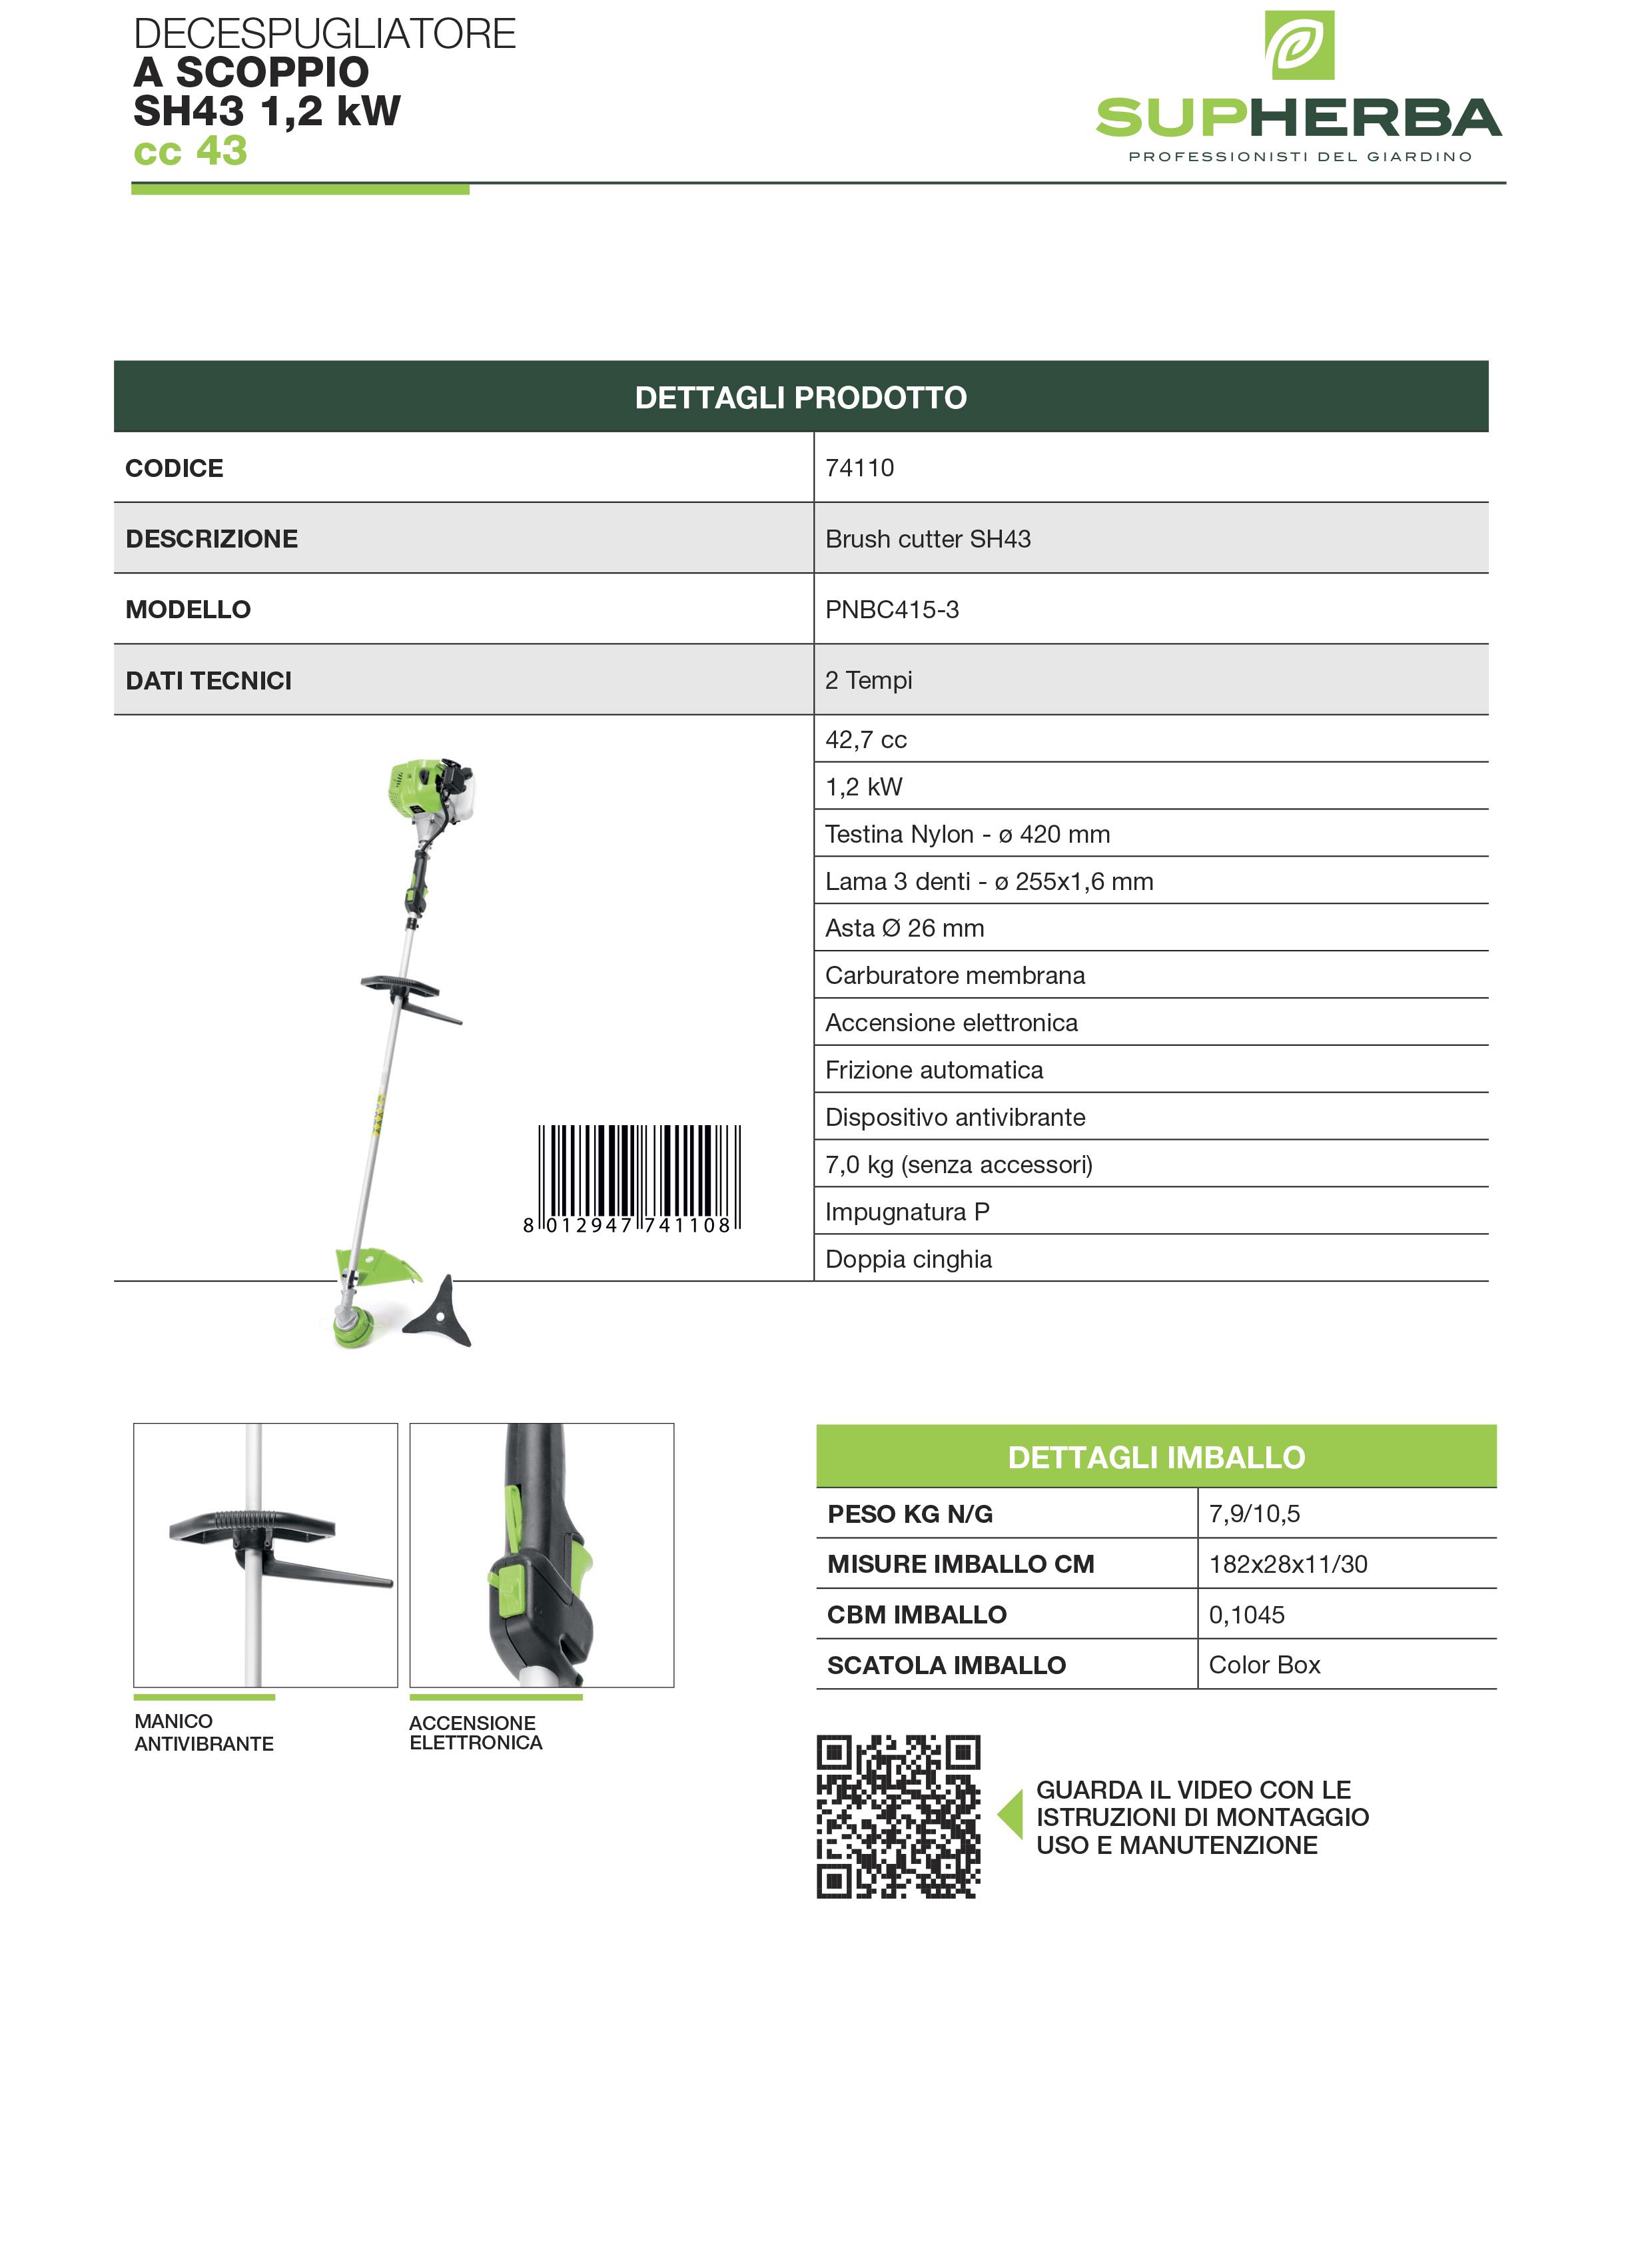 DECESPUGLIATORE SH43 2T 42,7cc 1,20kW  7,2kg - SUPHERBA 8012947741108 prodottiferramenta